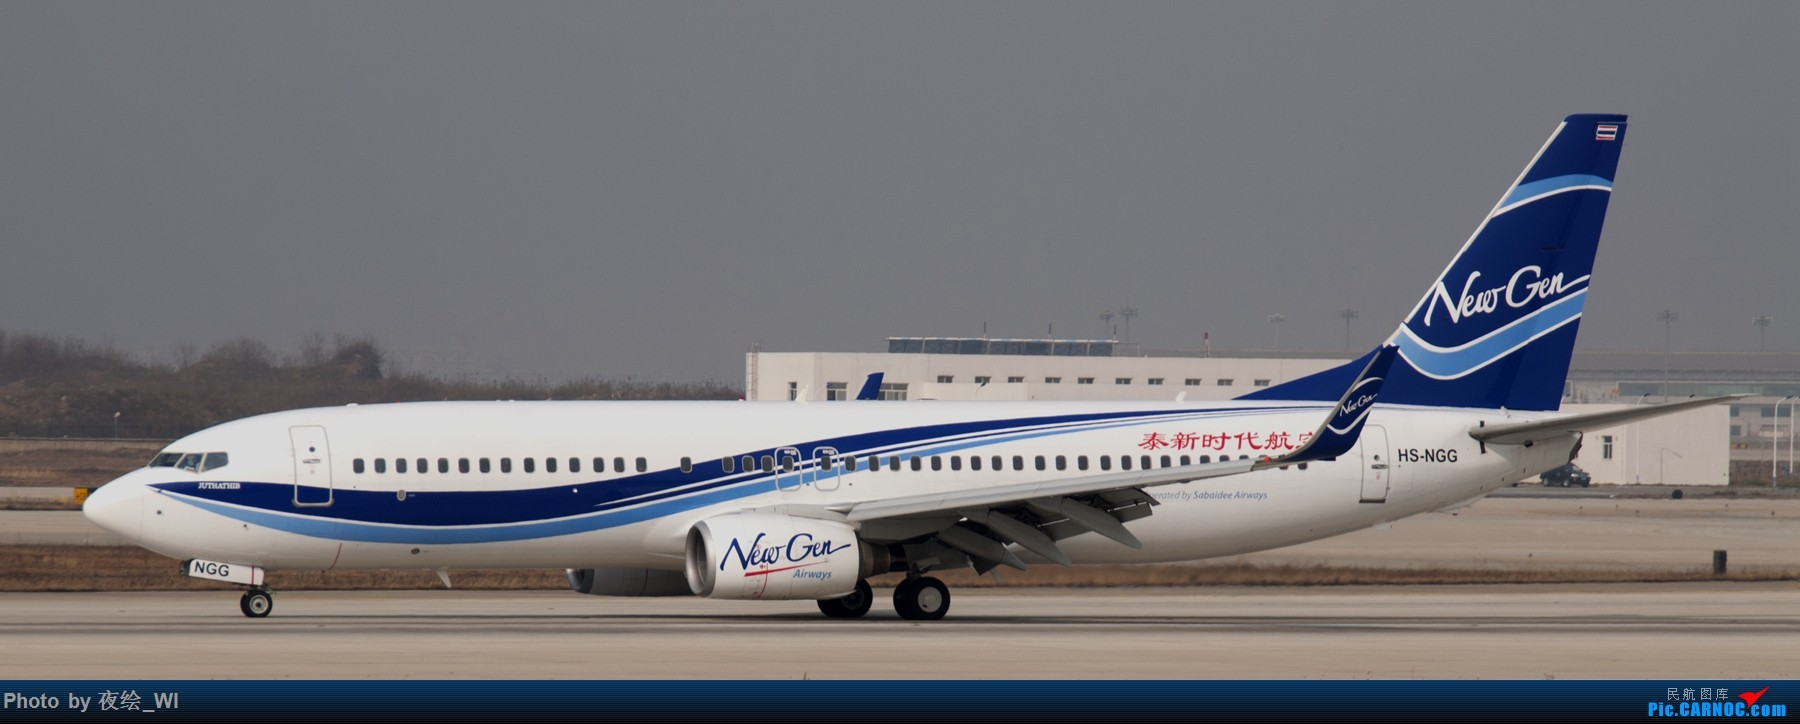 Re:[原创]NKG,2016新年第一拍,邮航734及众多彩绘 BOEING 737-800 HS-NGG 中国南京禄口国际机场